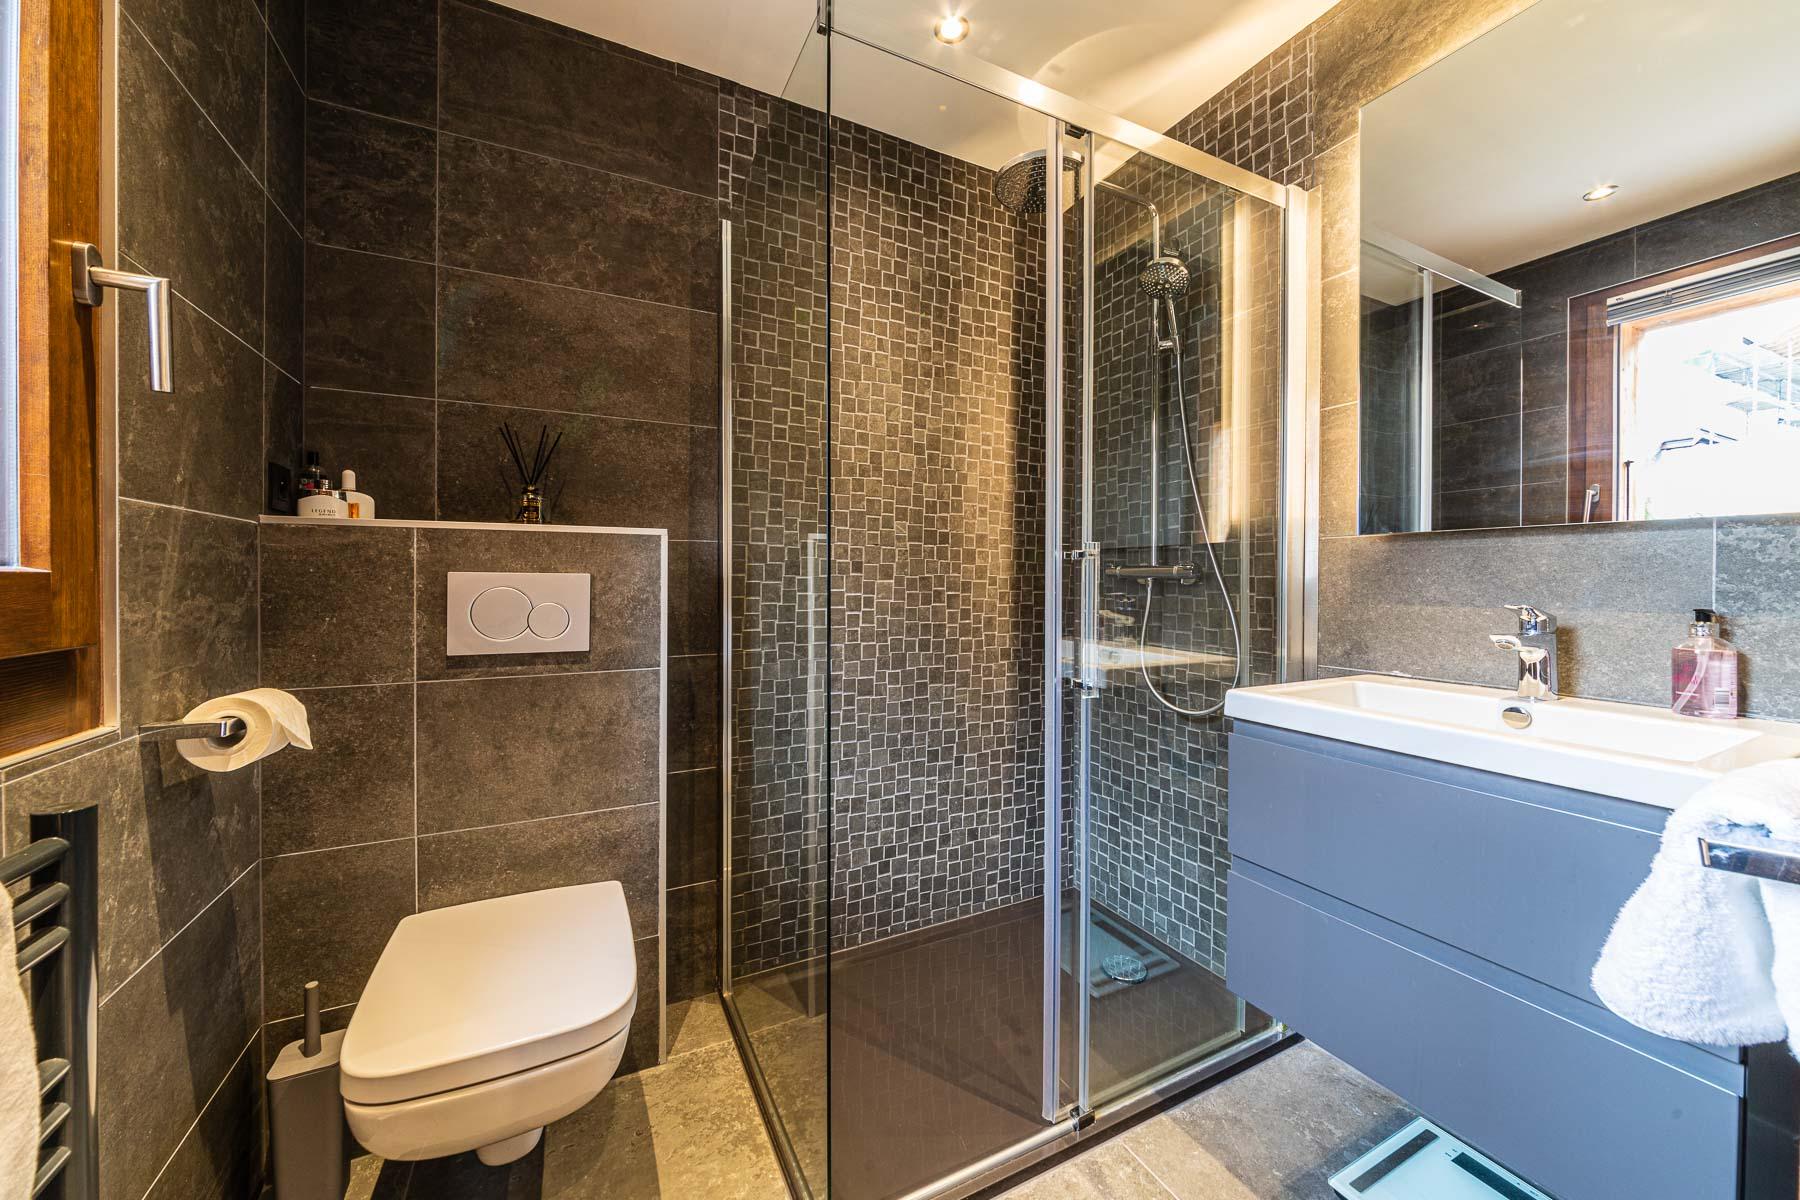 Kterra 1 En-Suite Shower Room